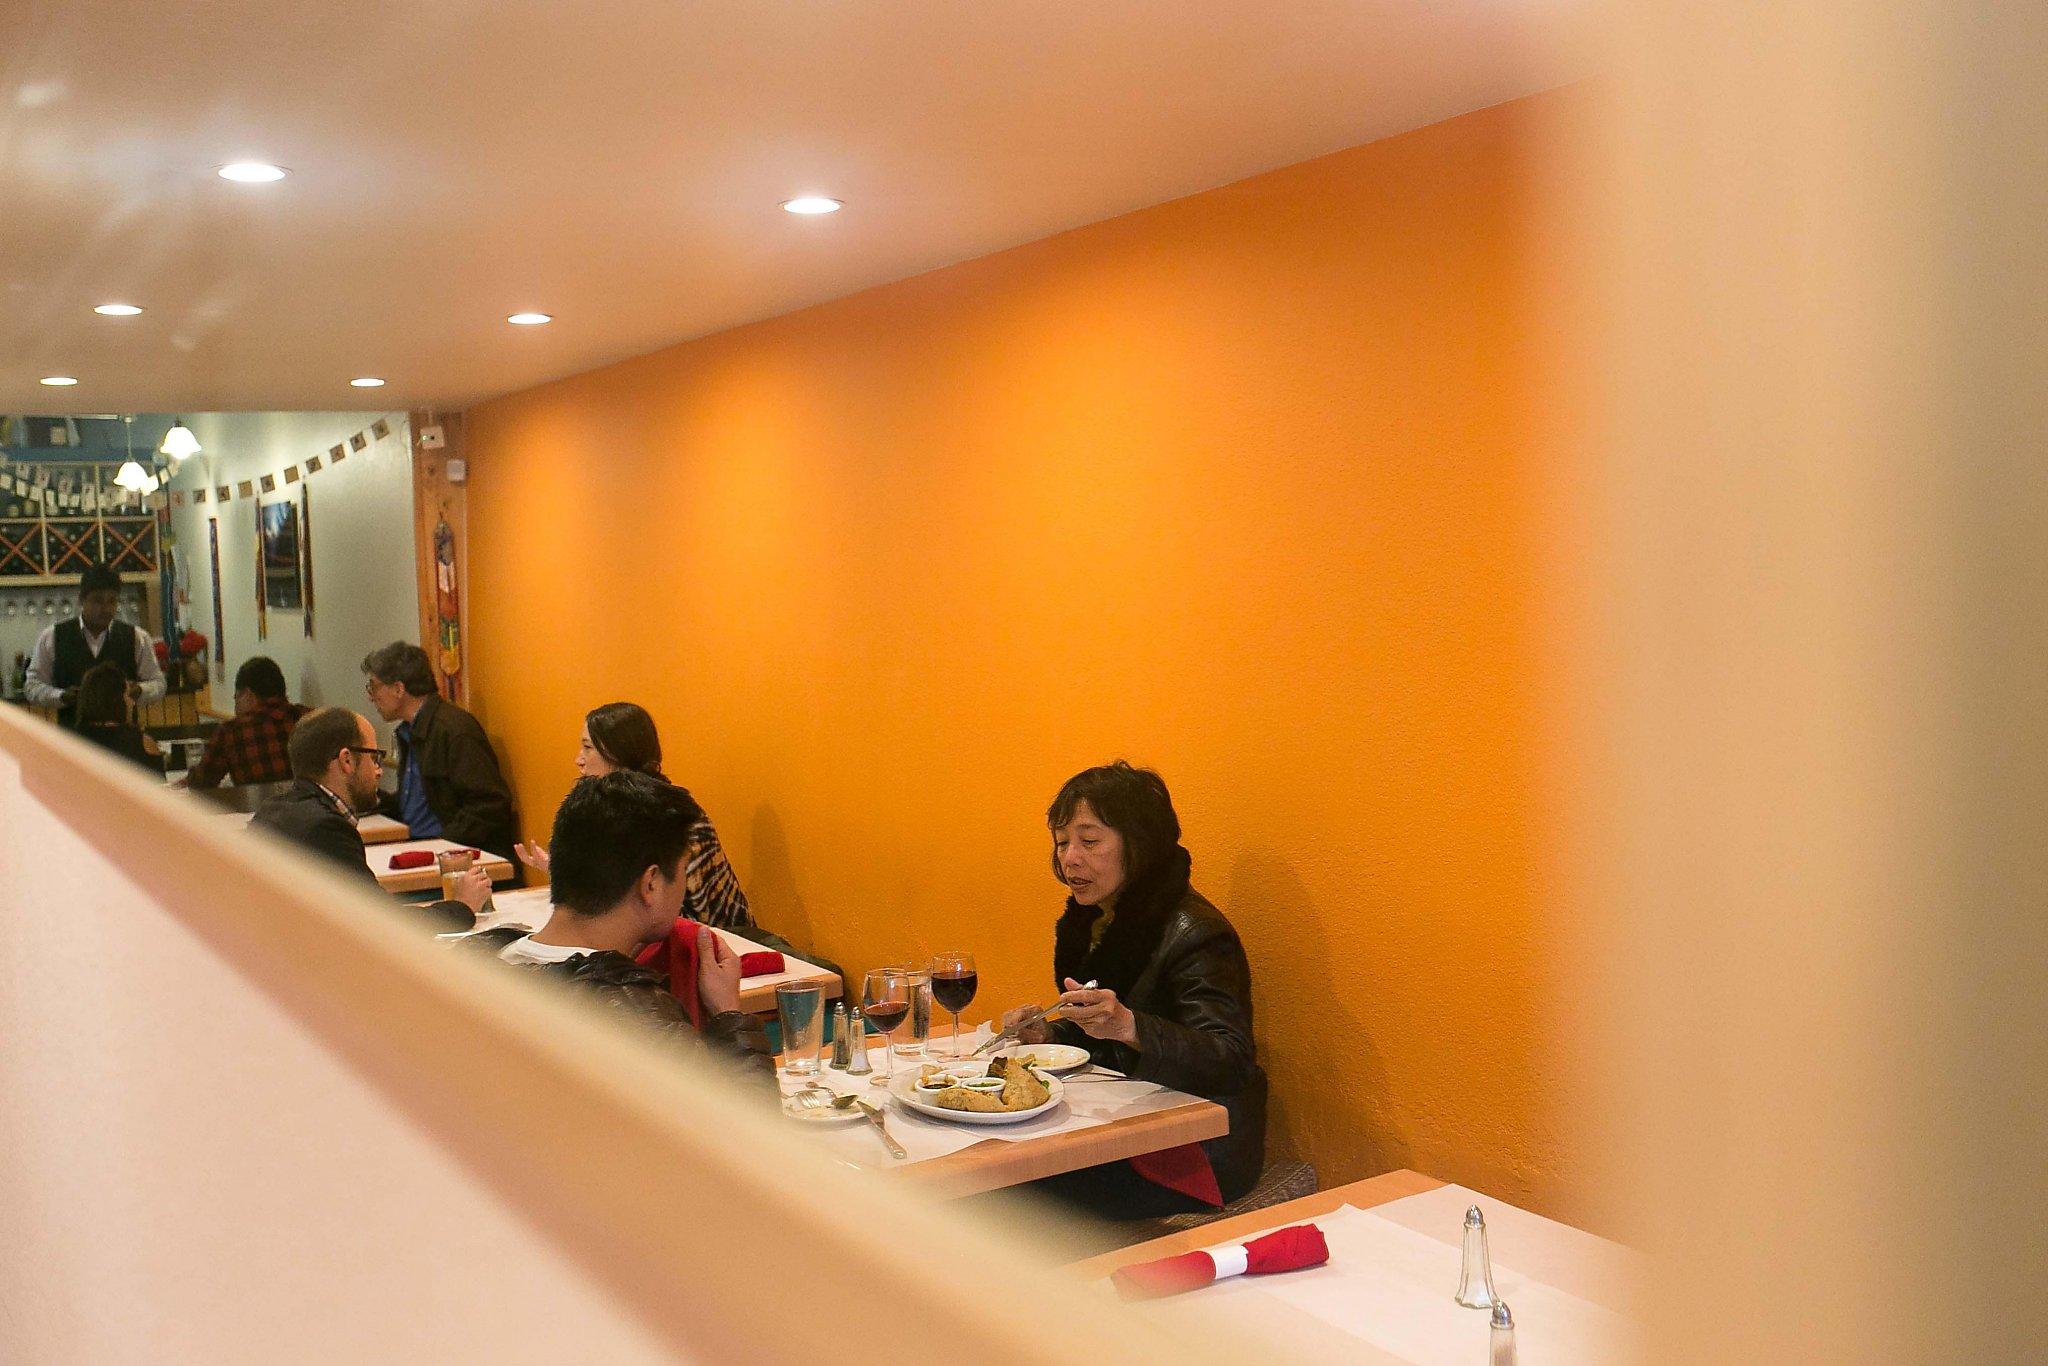 Yelp's list of most popular San Francisco restaurants by neighborhood is surprising and random